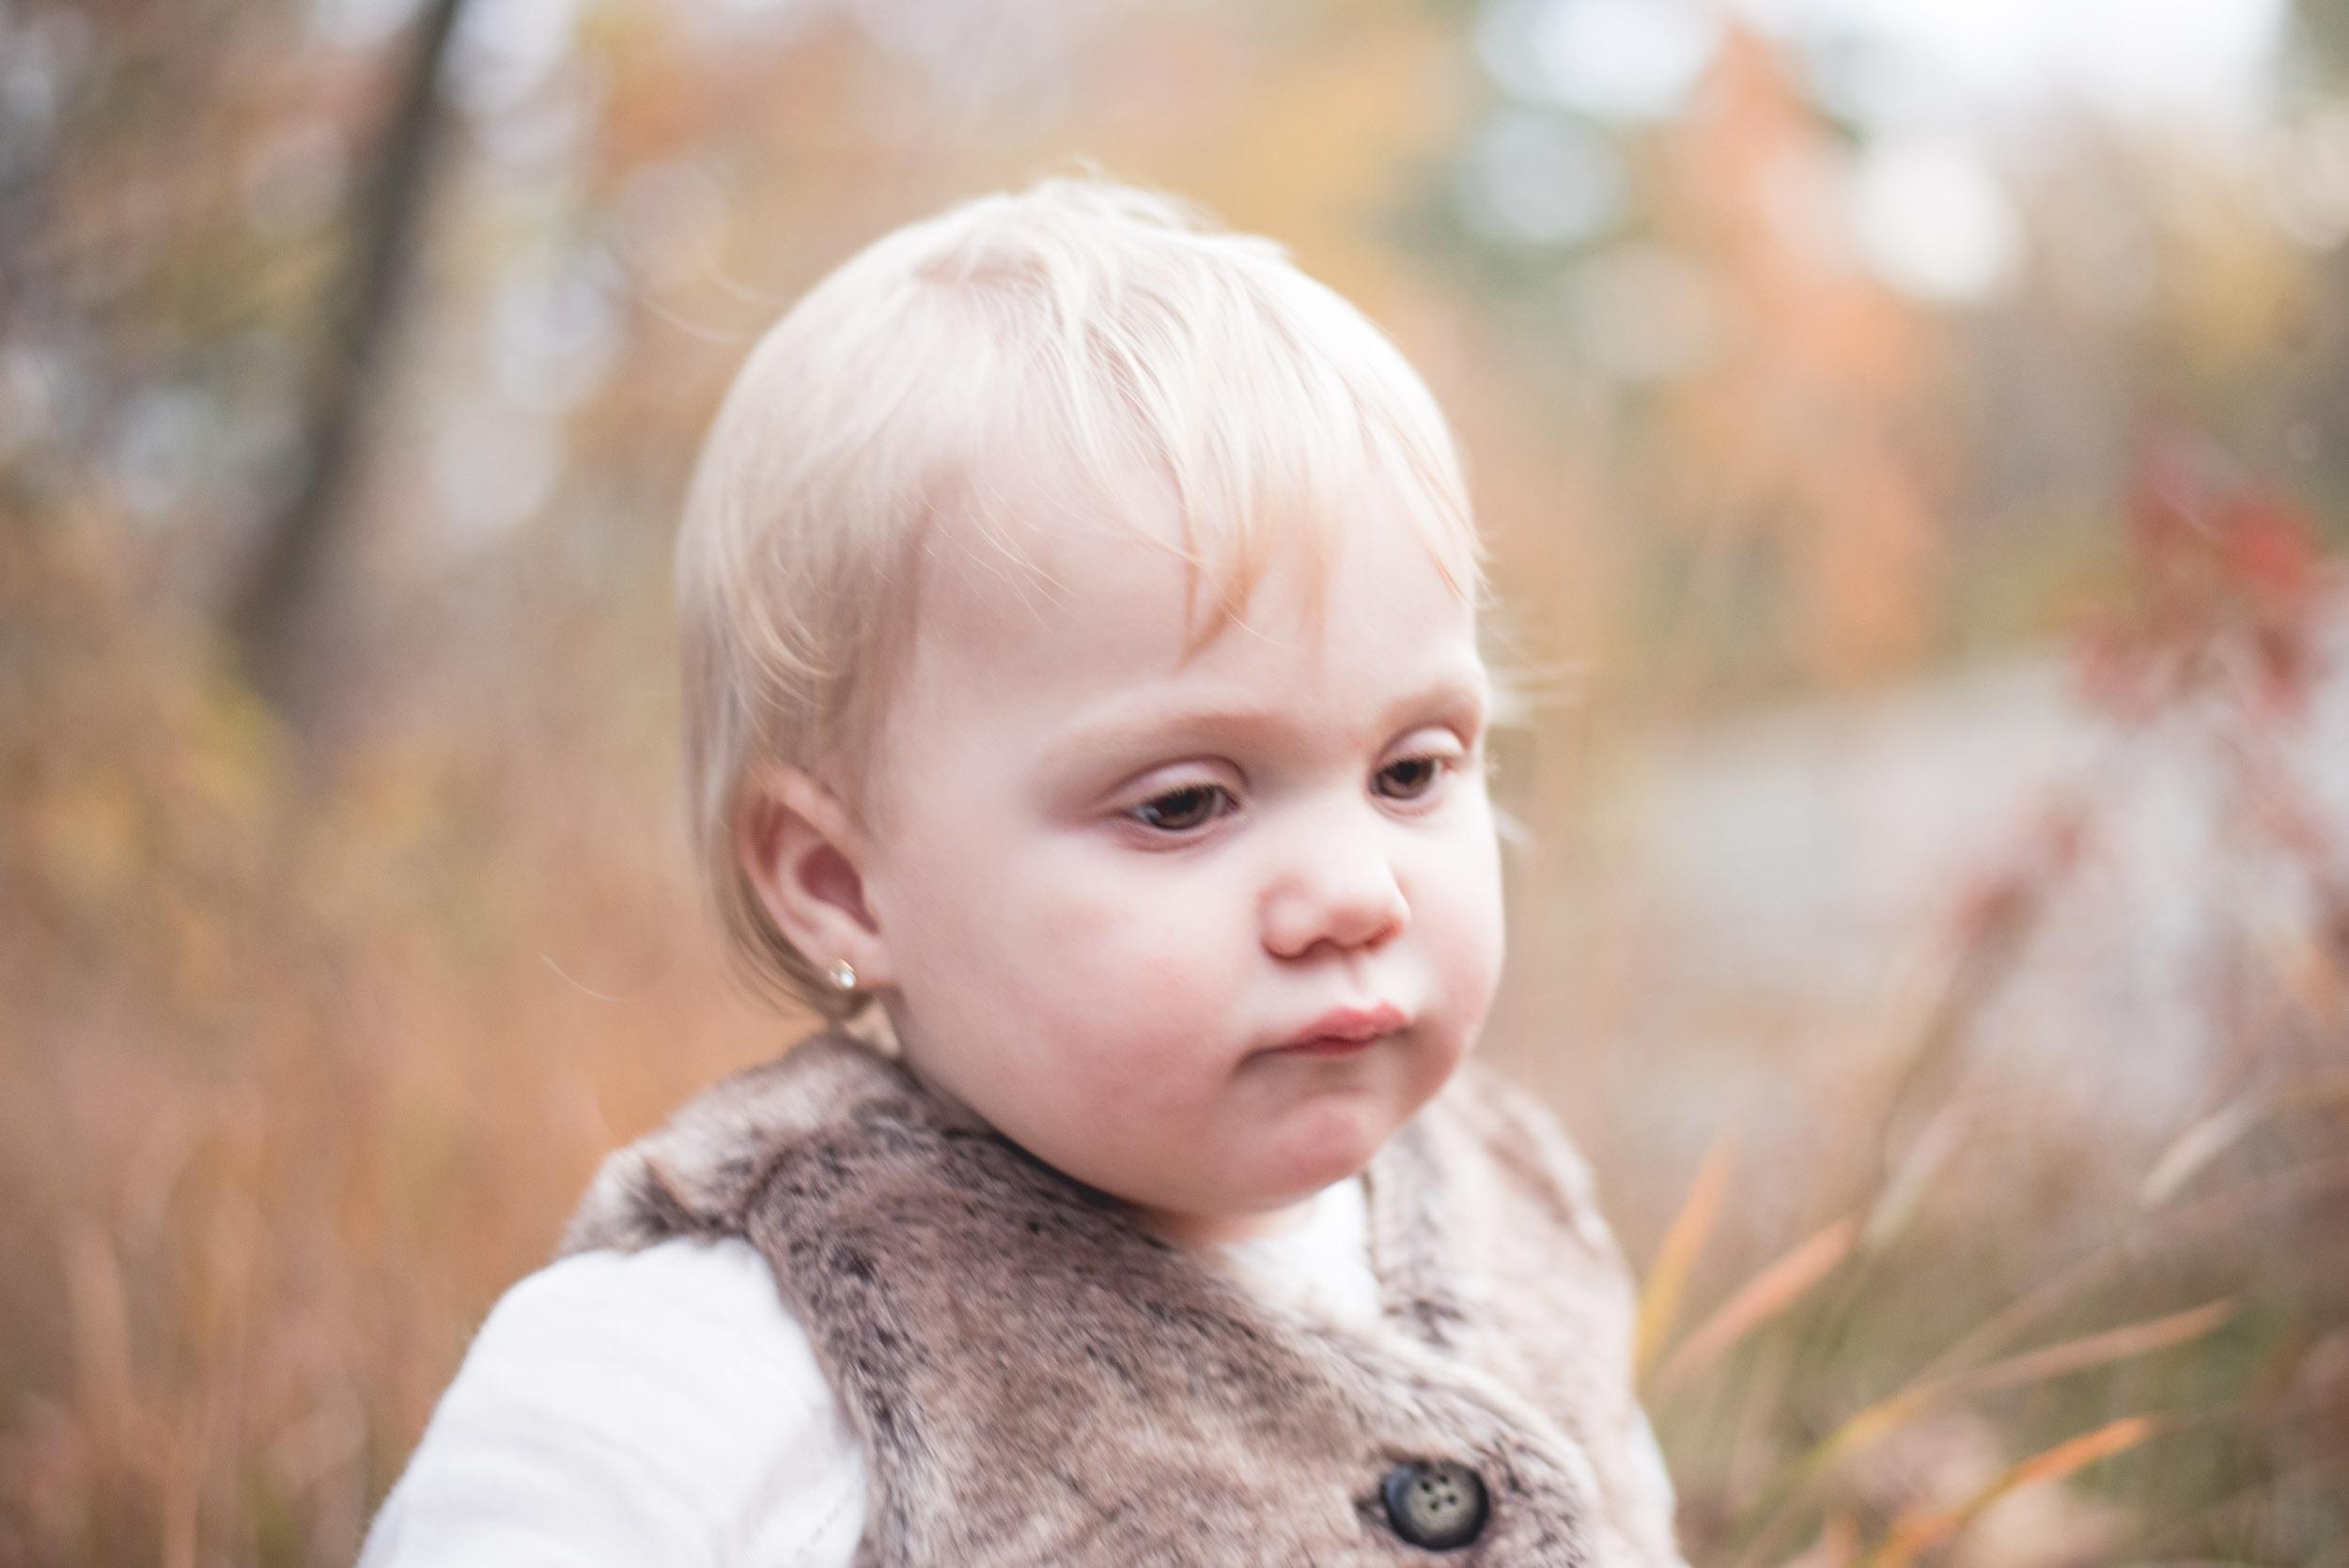 Ramsey_Child_Family_Photo_Session_Maryland_Crofton_Gambrills(12of12).jpg